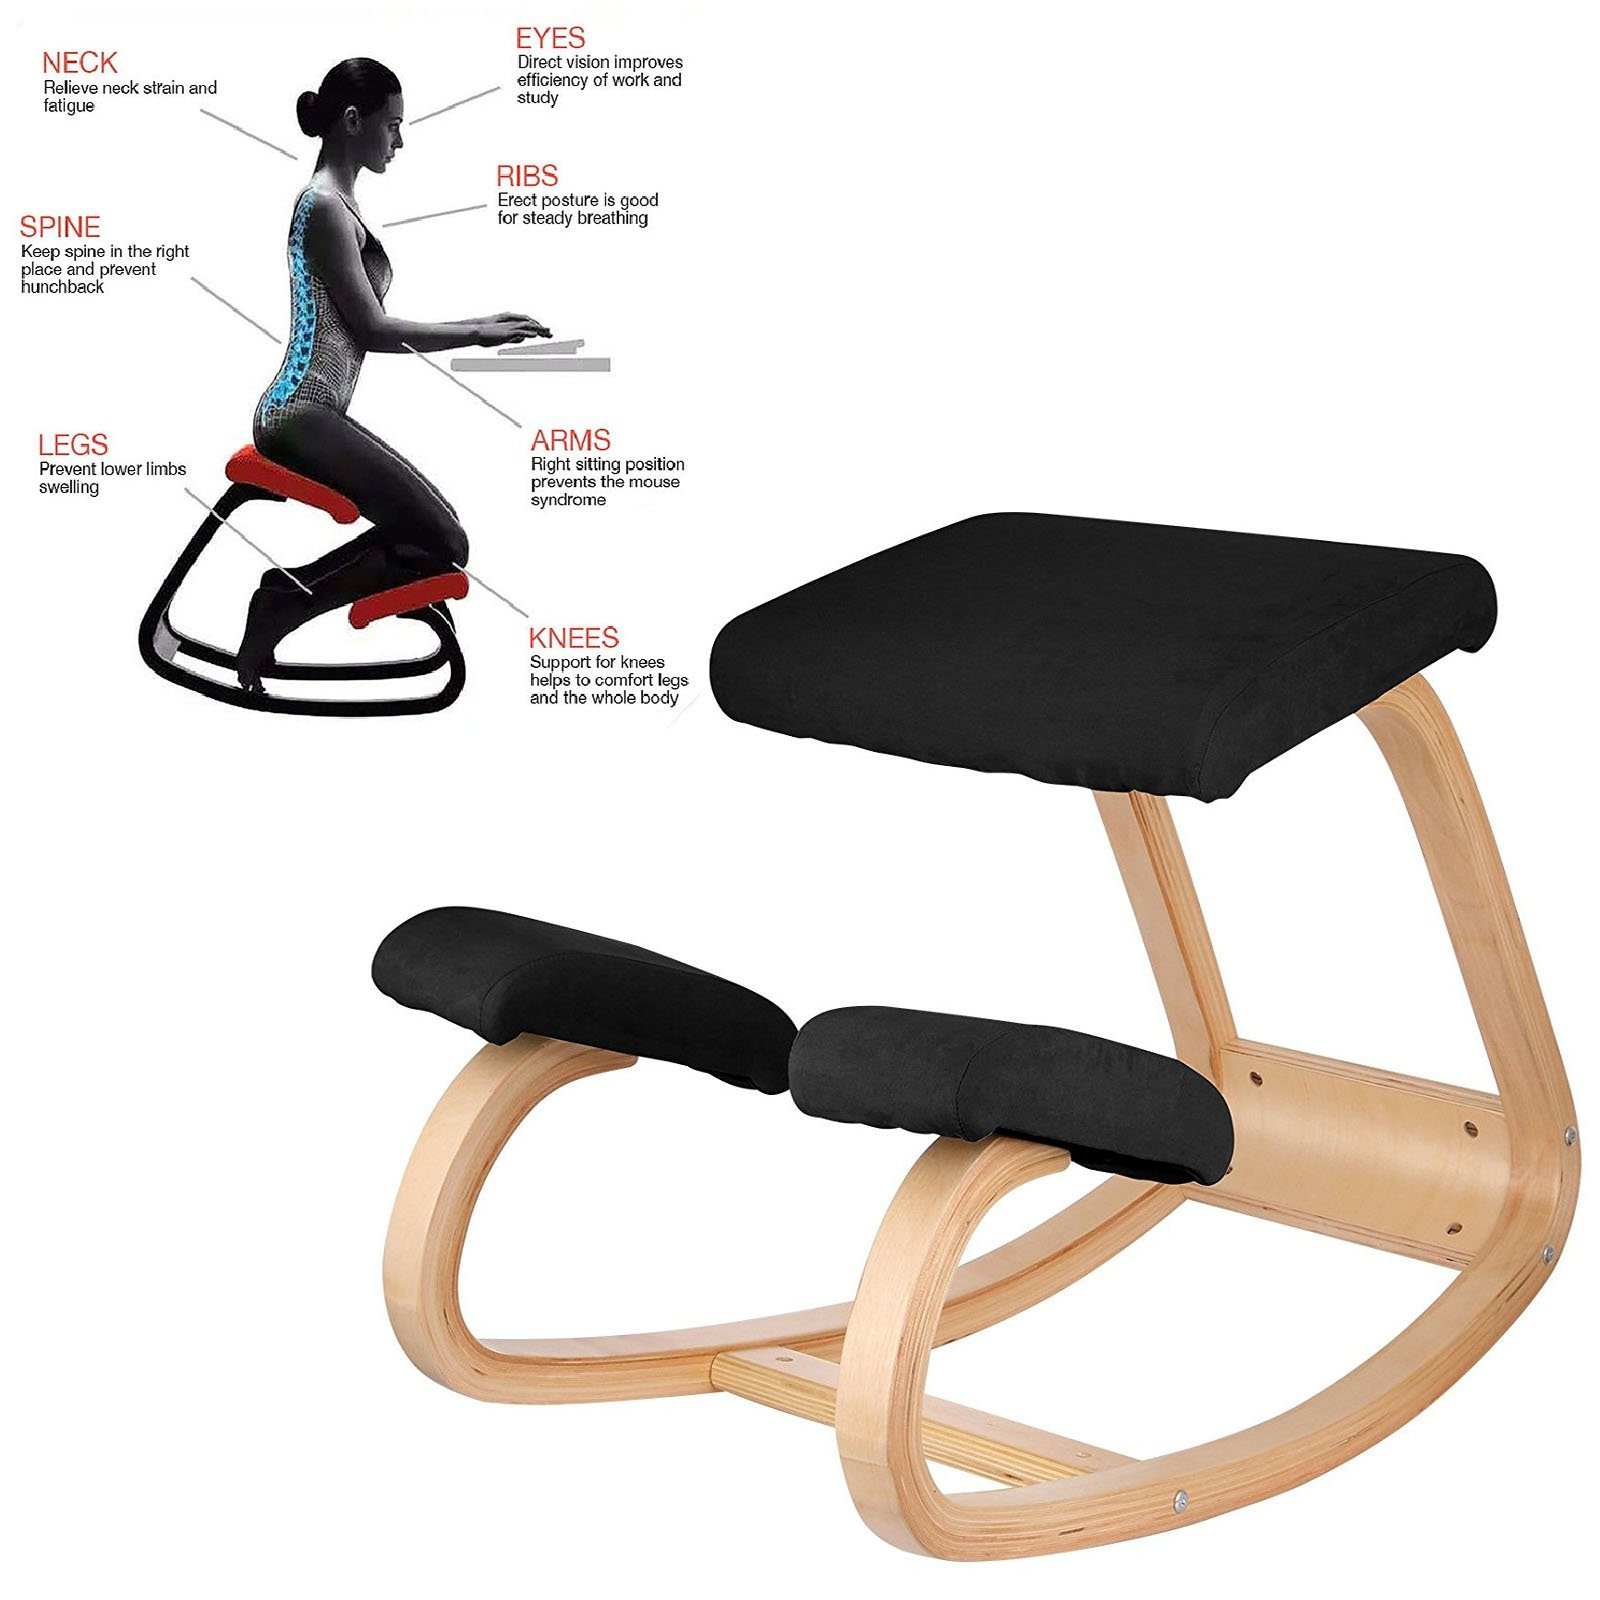 Superland Wooden Ergonomic Kneeling Chair Better Posture Kneeling Stool Bentwood Comfortable Ergonomic Office Chair Great Home Office or Desk Chair (OM-141 Black Kneeling Chair)